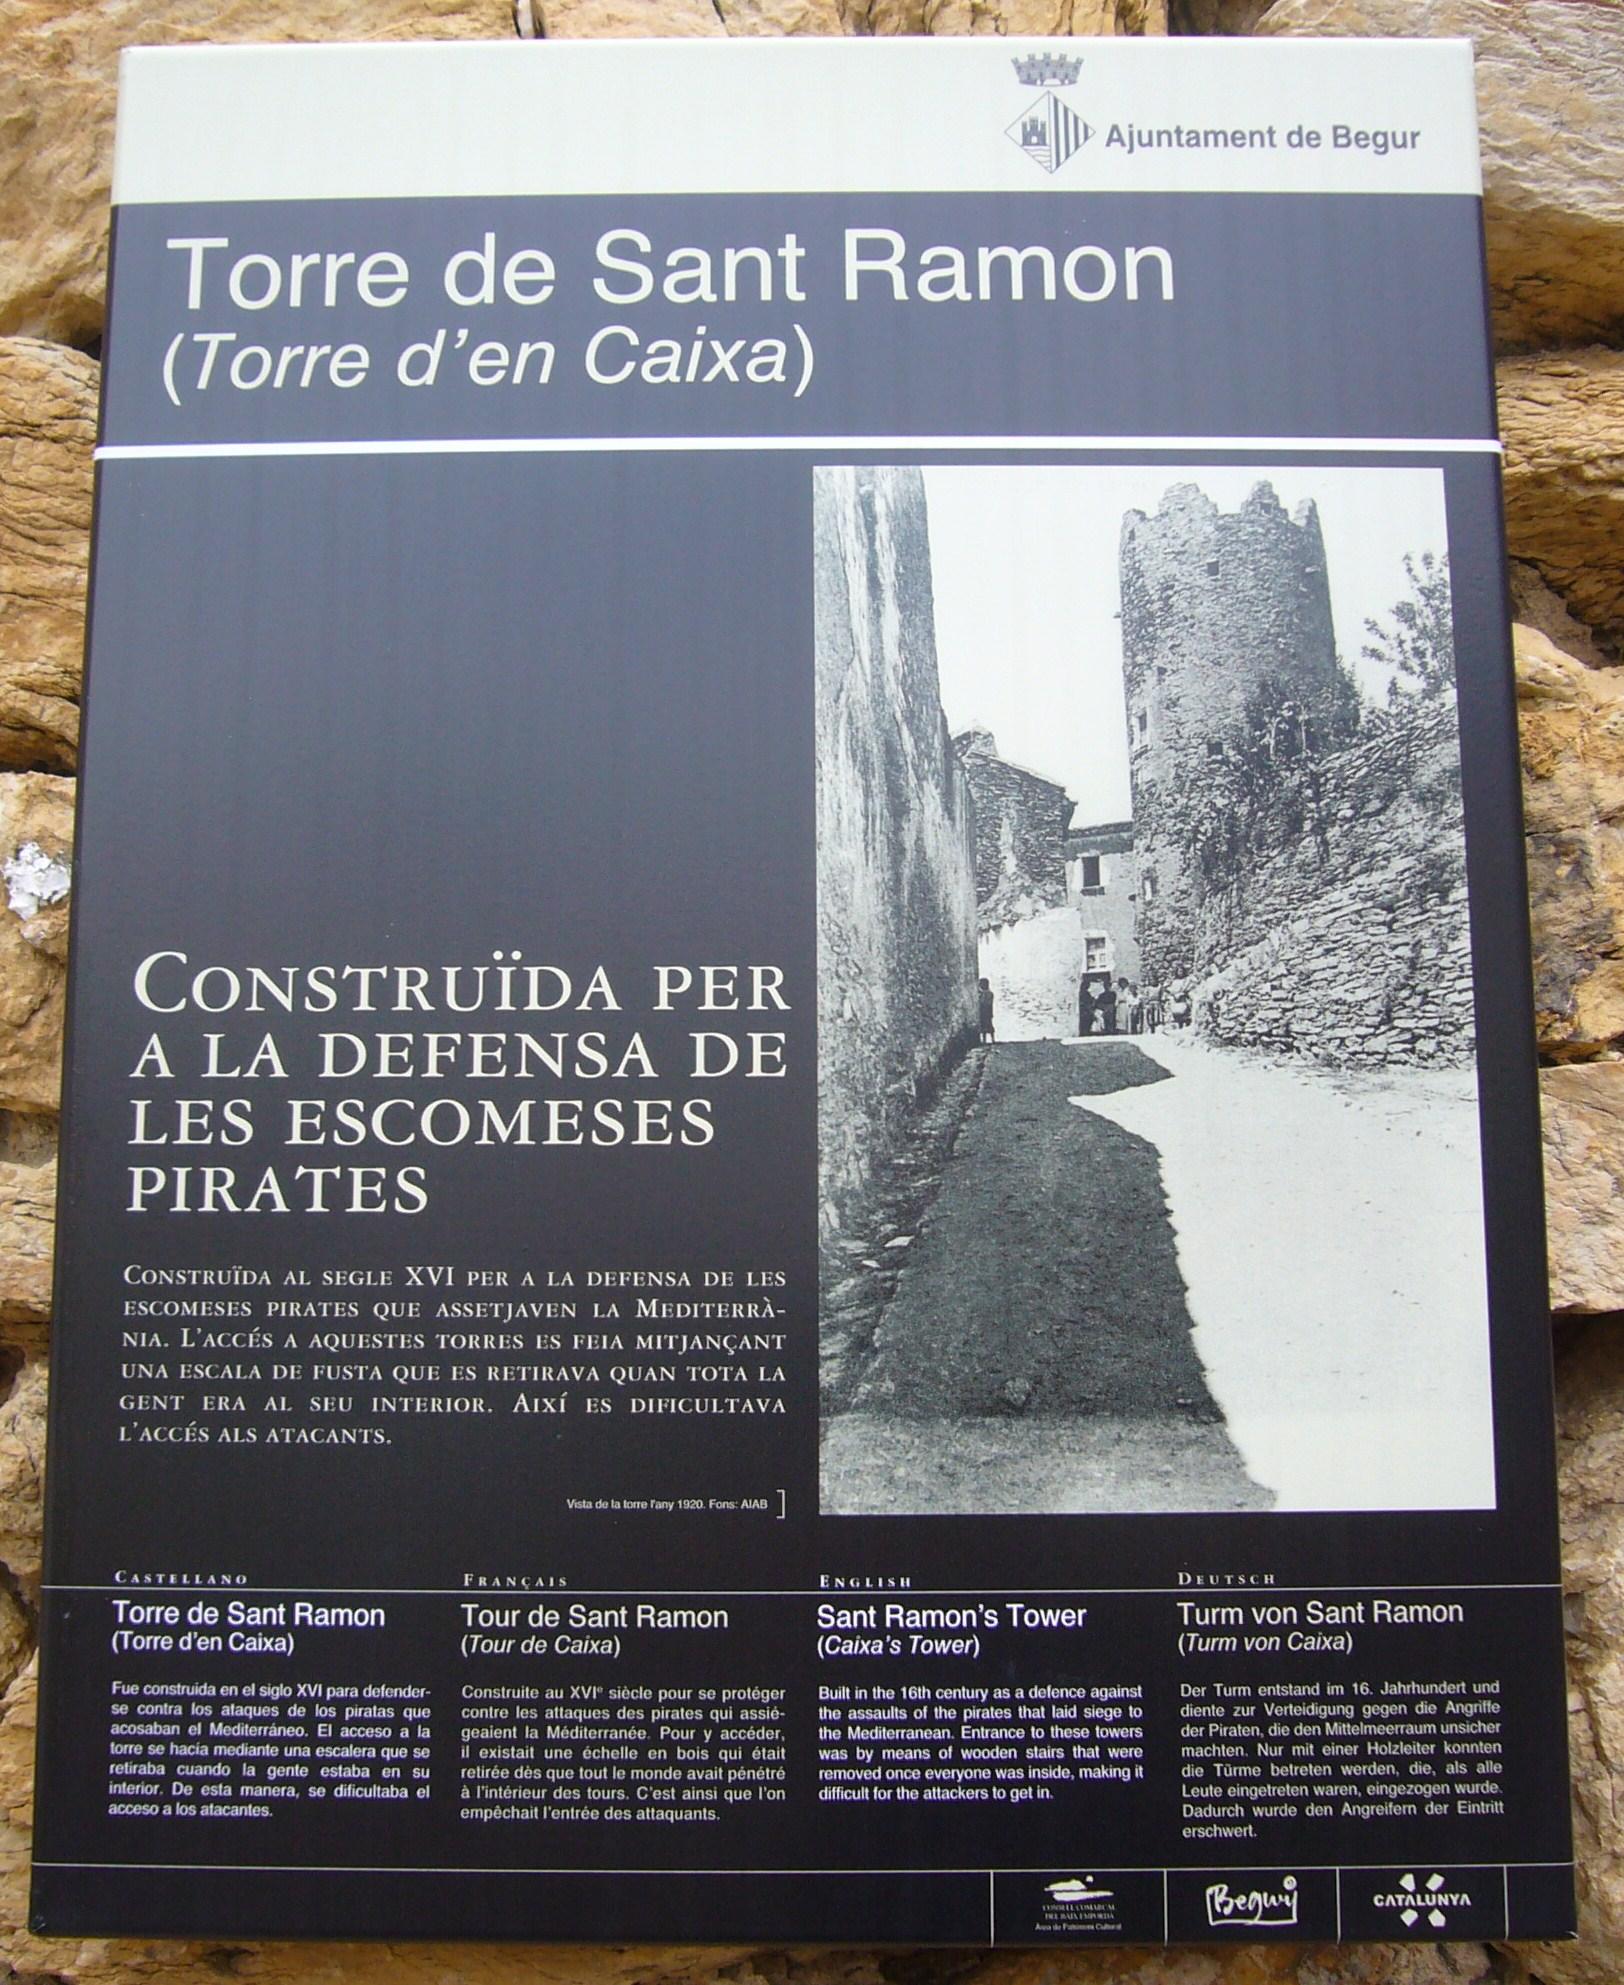 torre-del-carrer-sant-ramon-100225_501